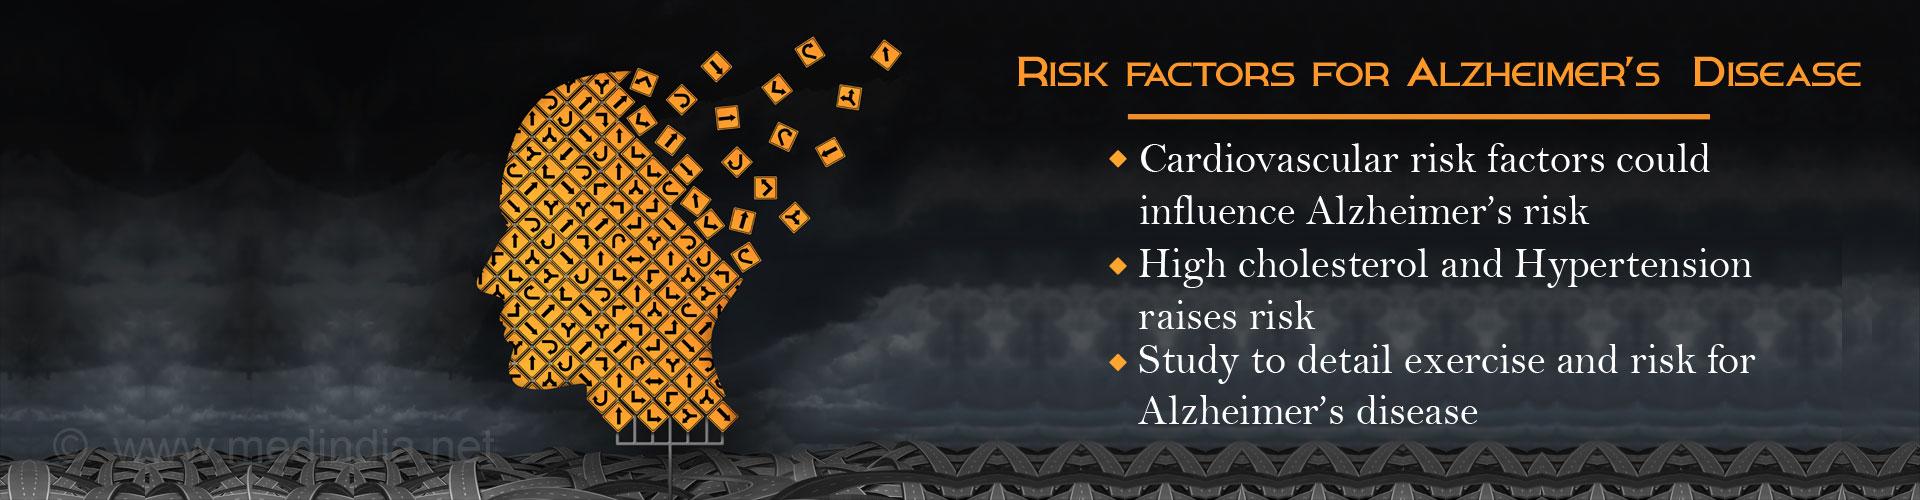 Cardiovascular Risk Reduction Studied in Alzheimer's Disease Prevention